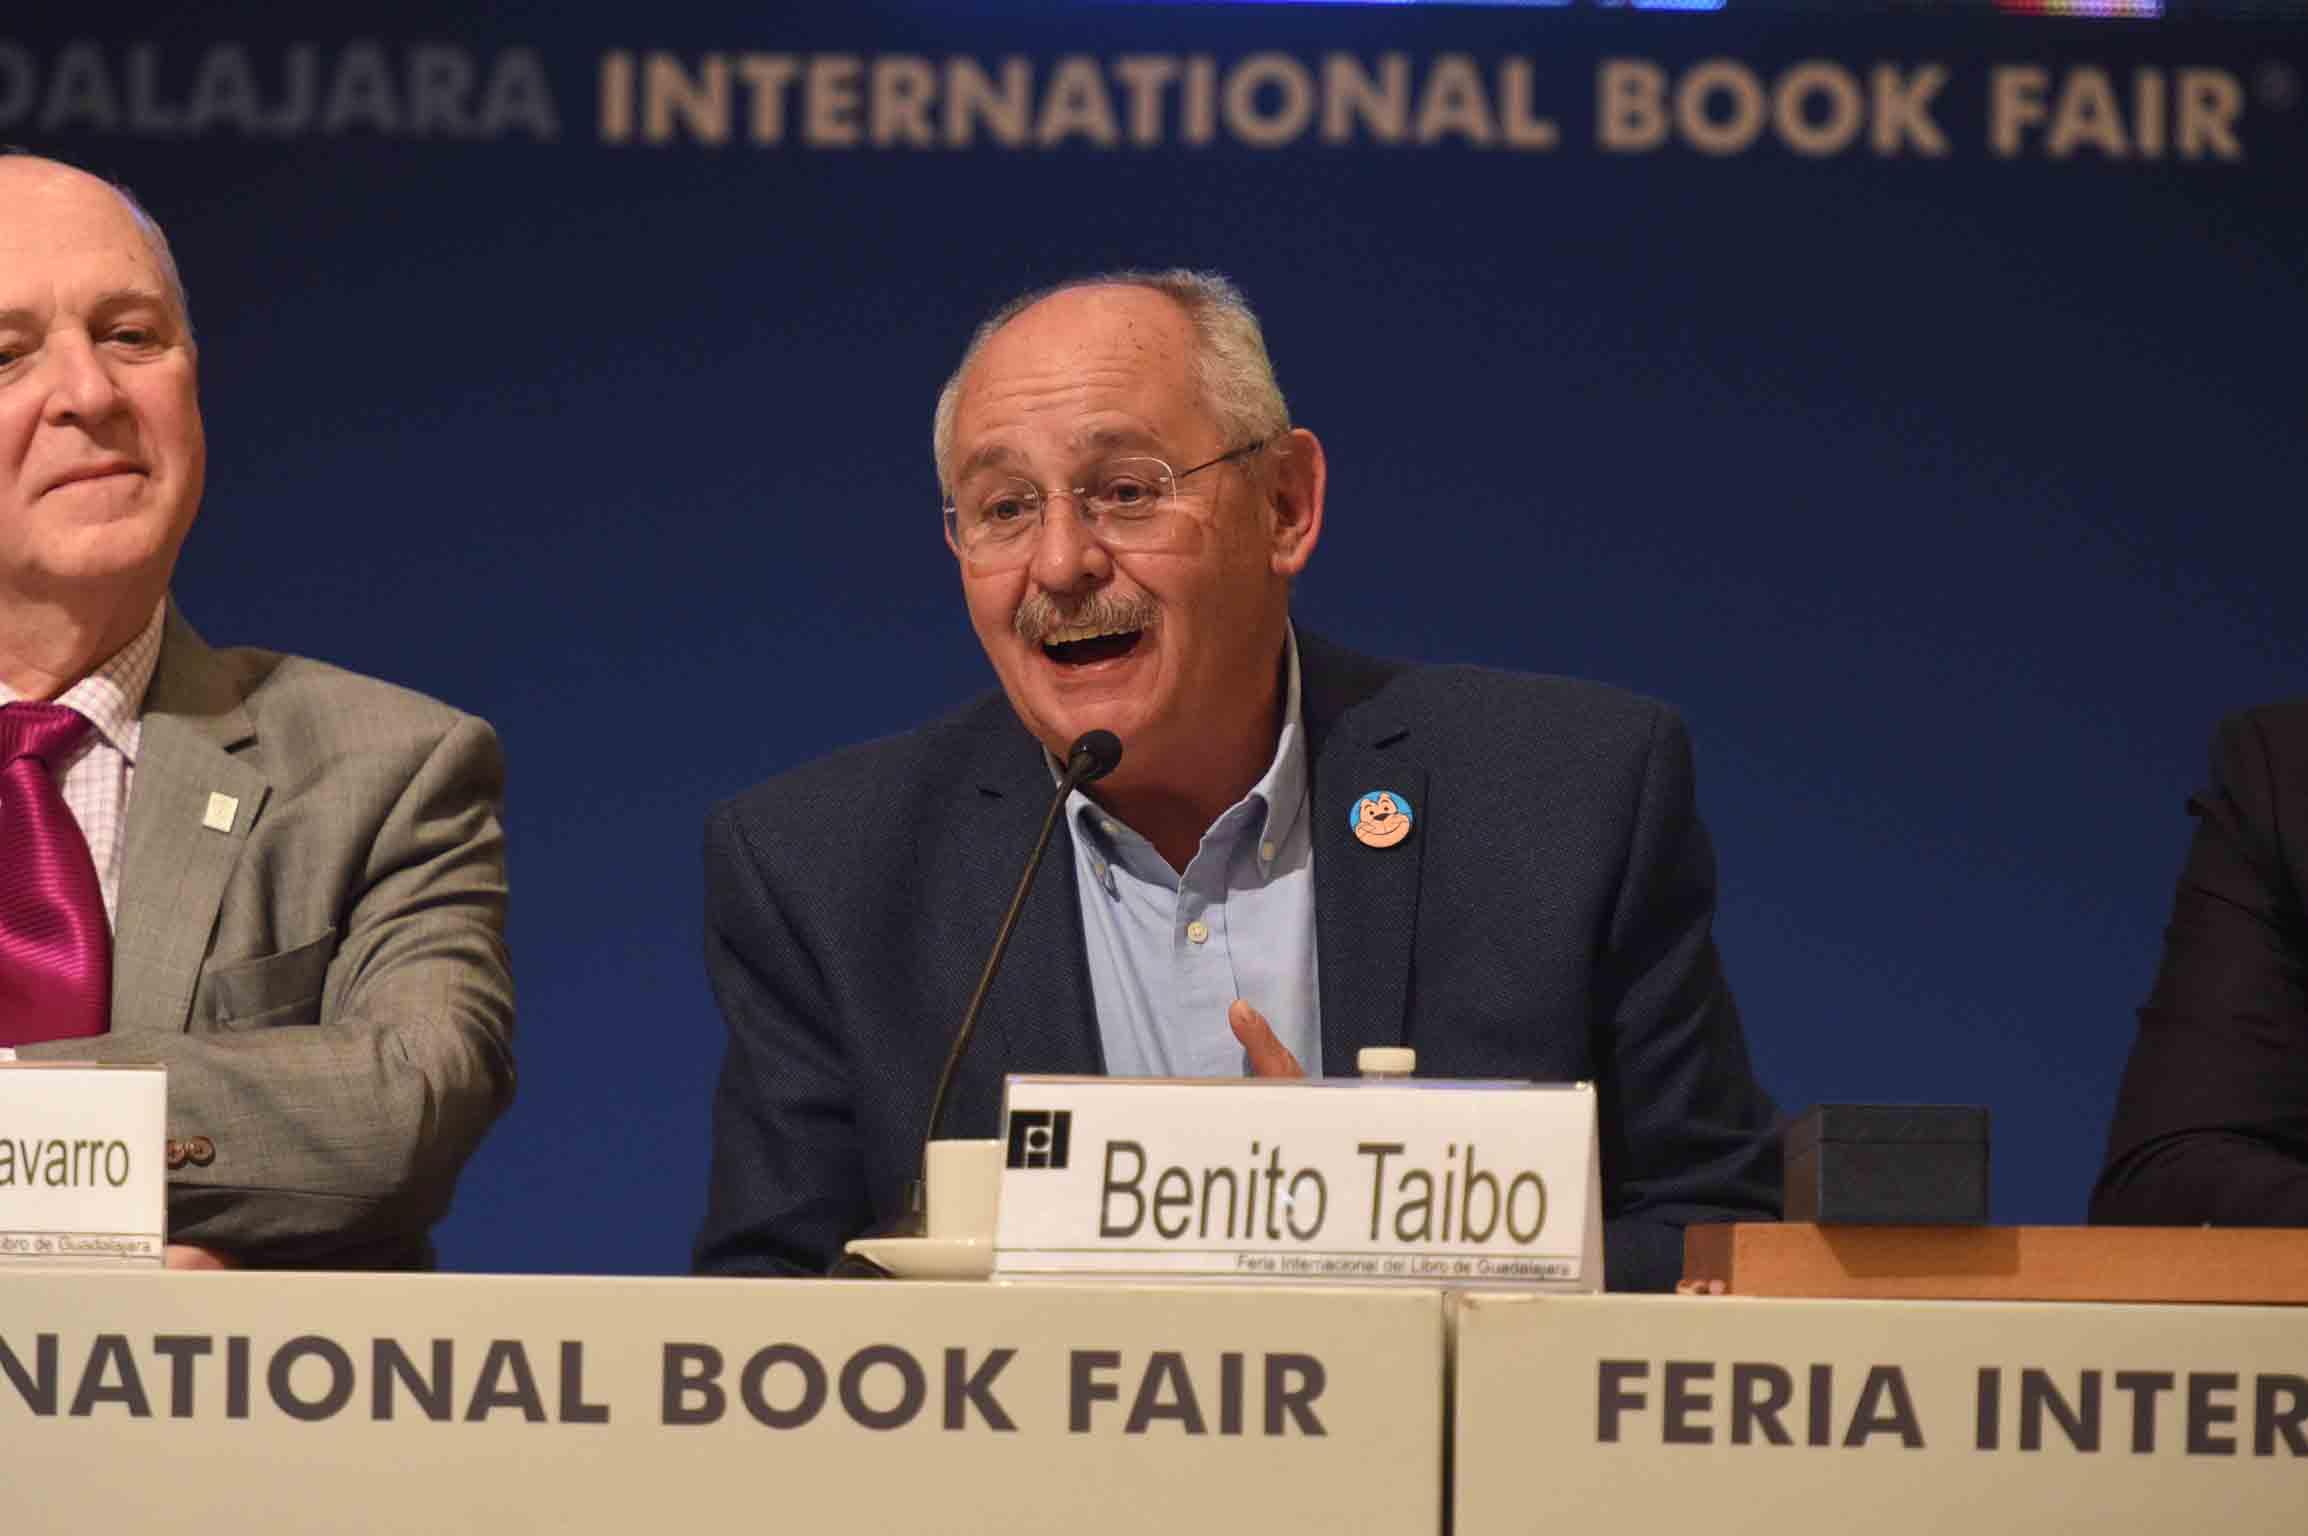 Benito Taibo, haciendo uso de la palabra durante su homenaje